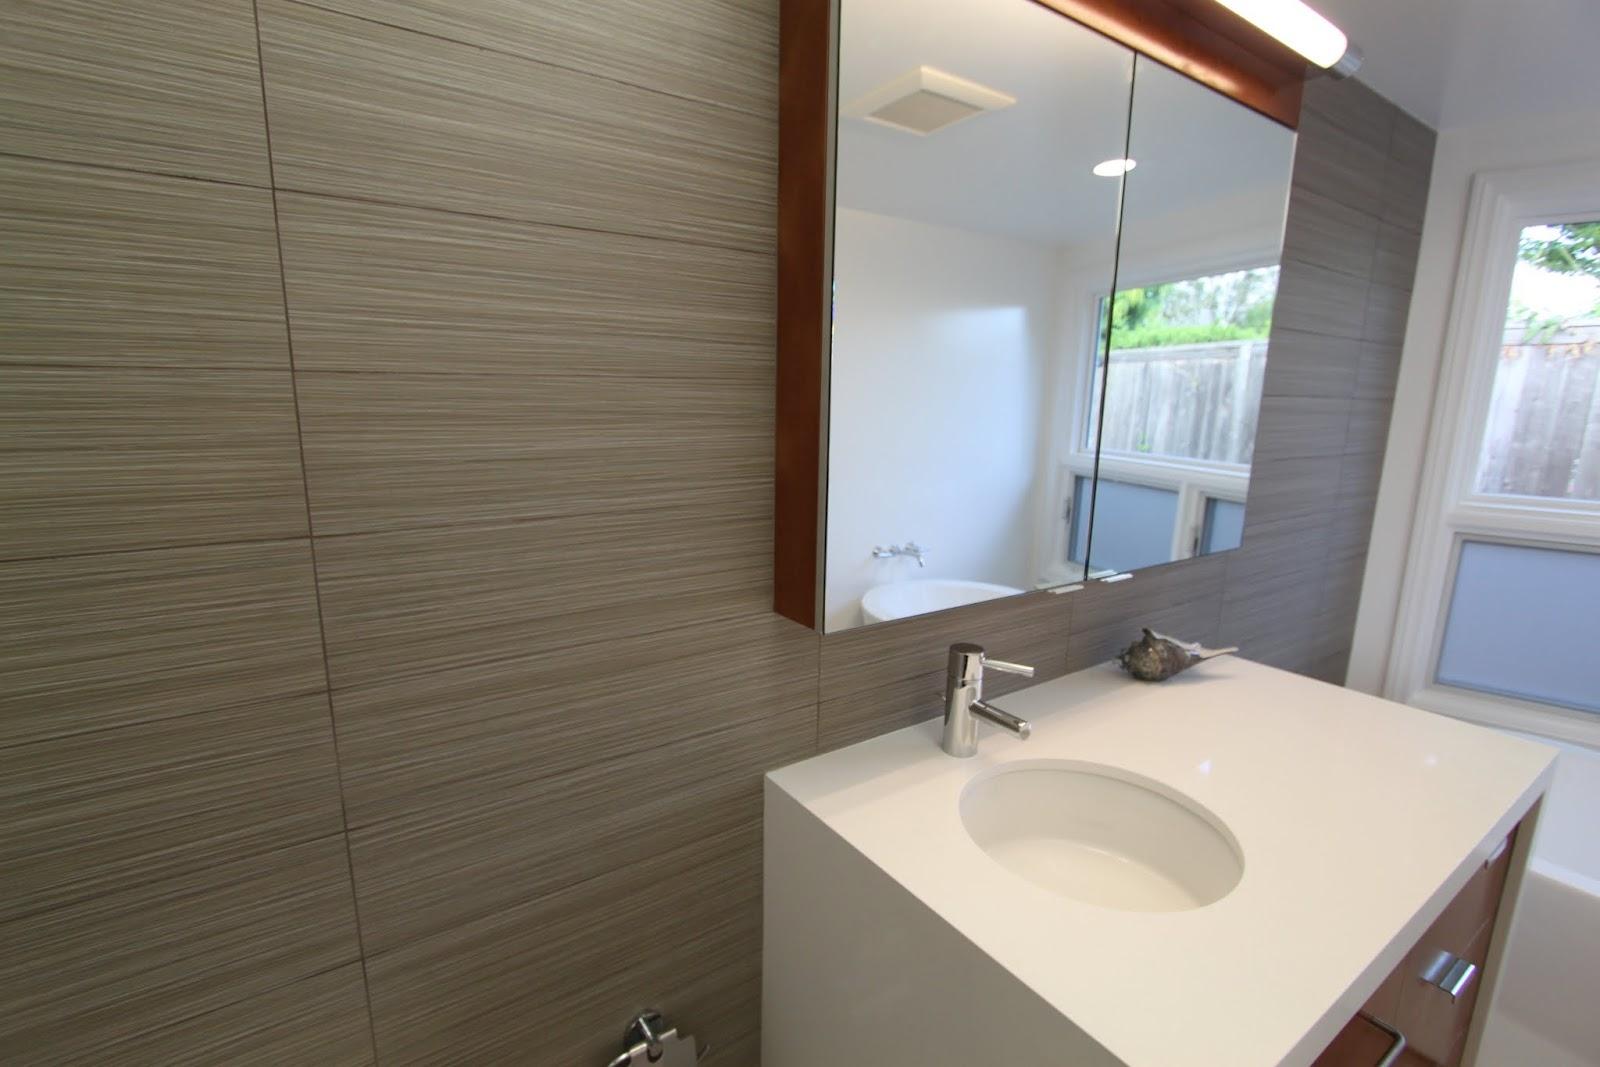 top five favorite features mid century bathroom remodel mid century modern remodel. Black Bedroom Furniture Sets. Home Design Ideas